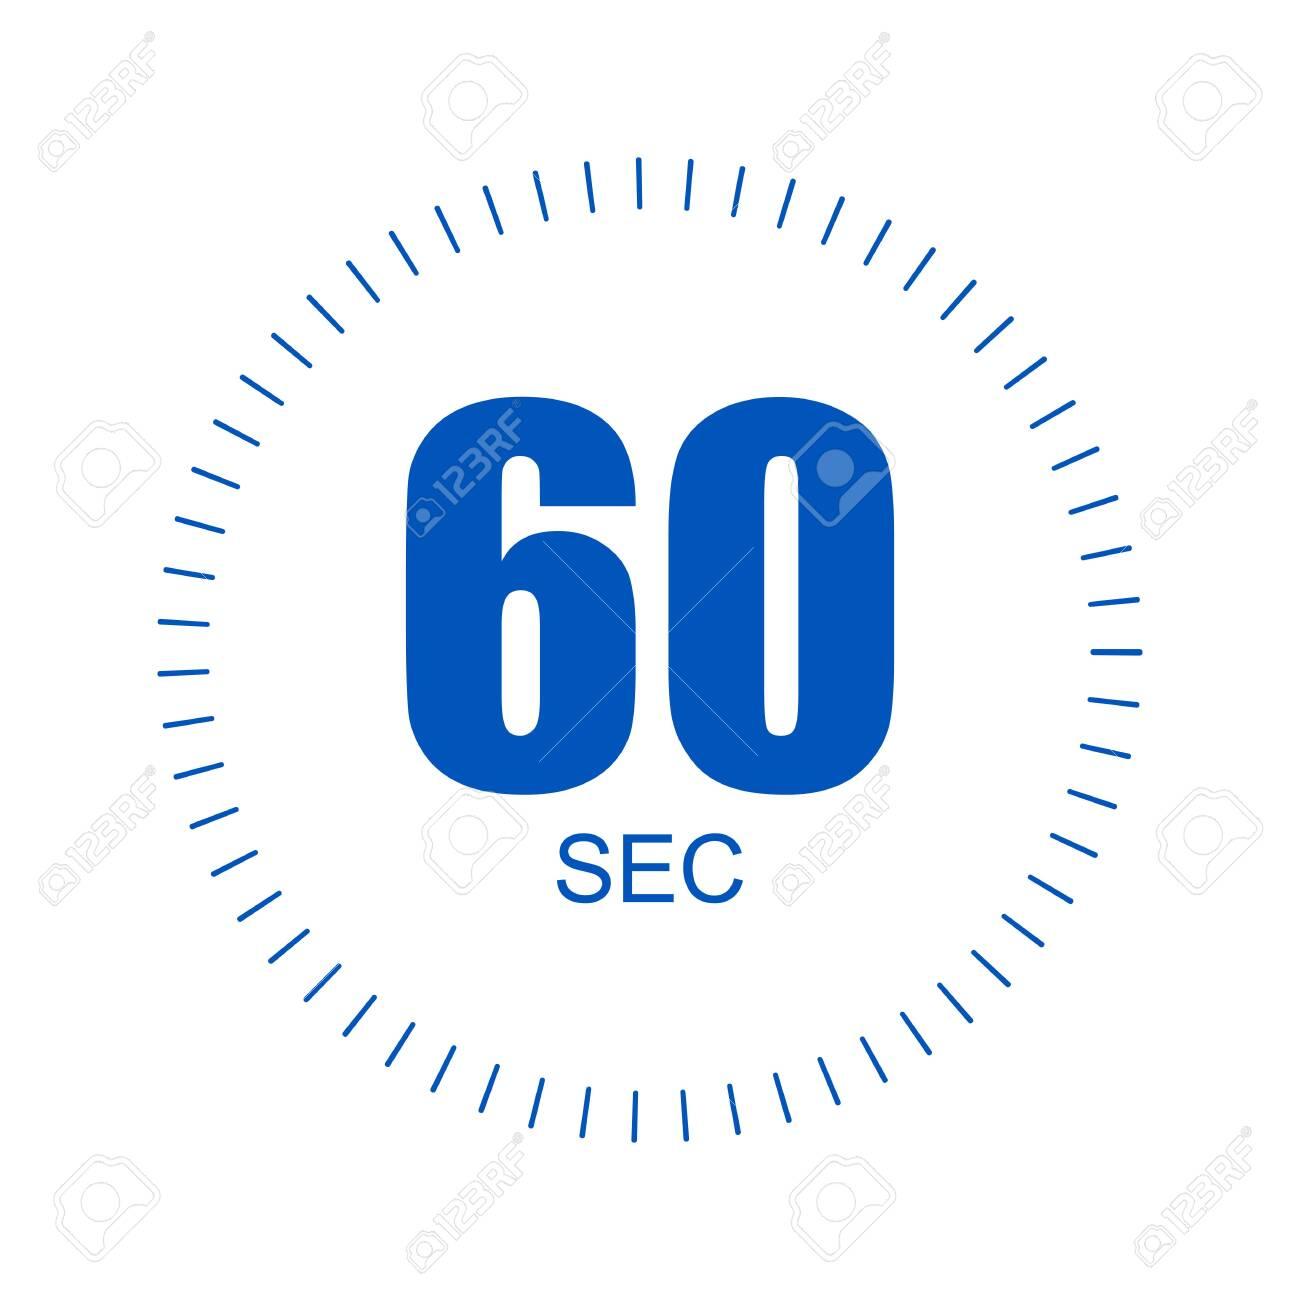 60 second time design over white background, vector illustration. EPS 10 - 155619298